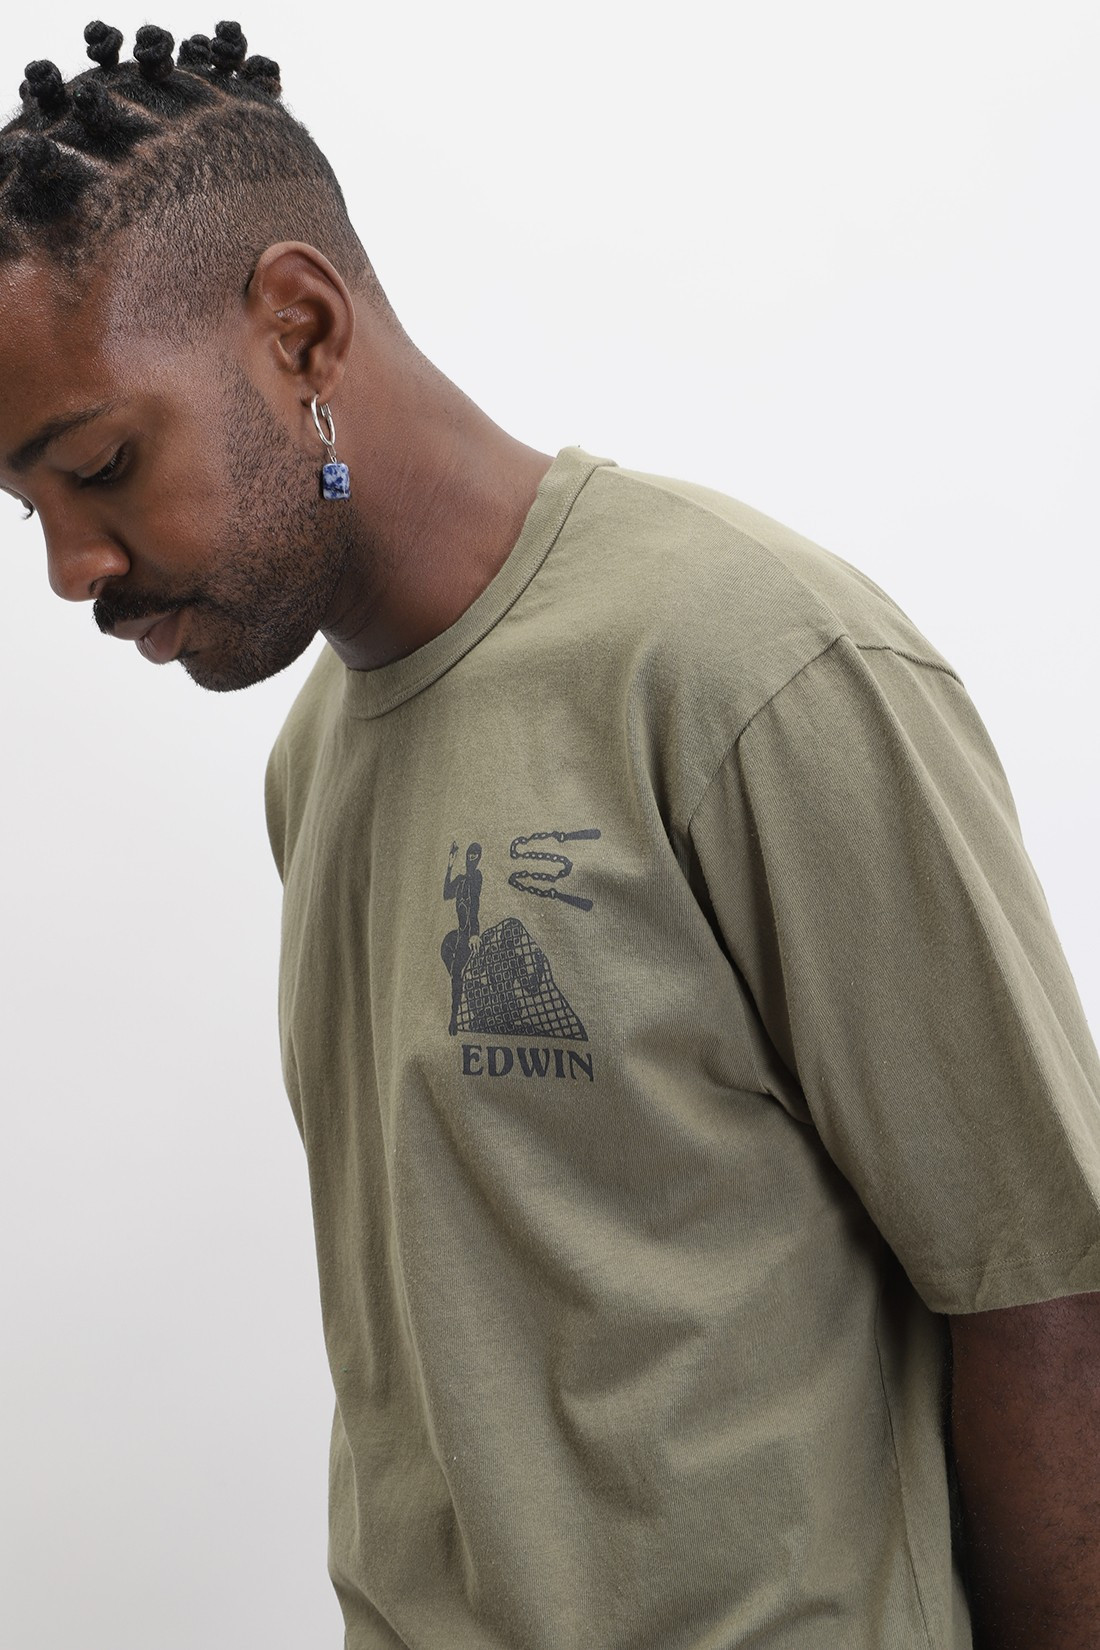 EDWIN / Shinobi t-shirt Martini olive